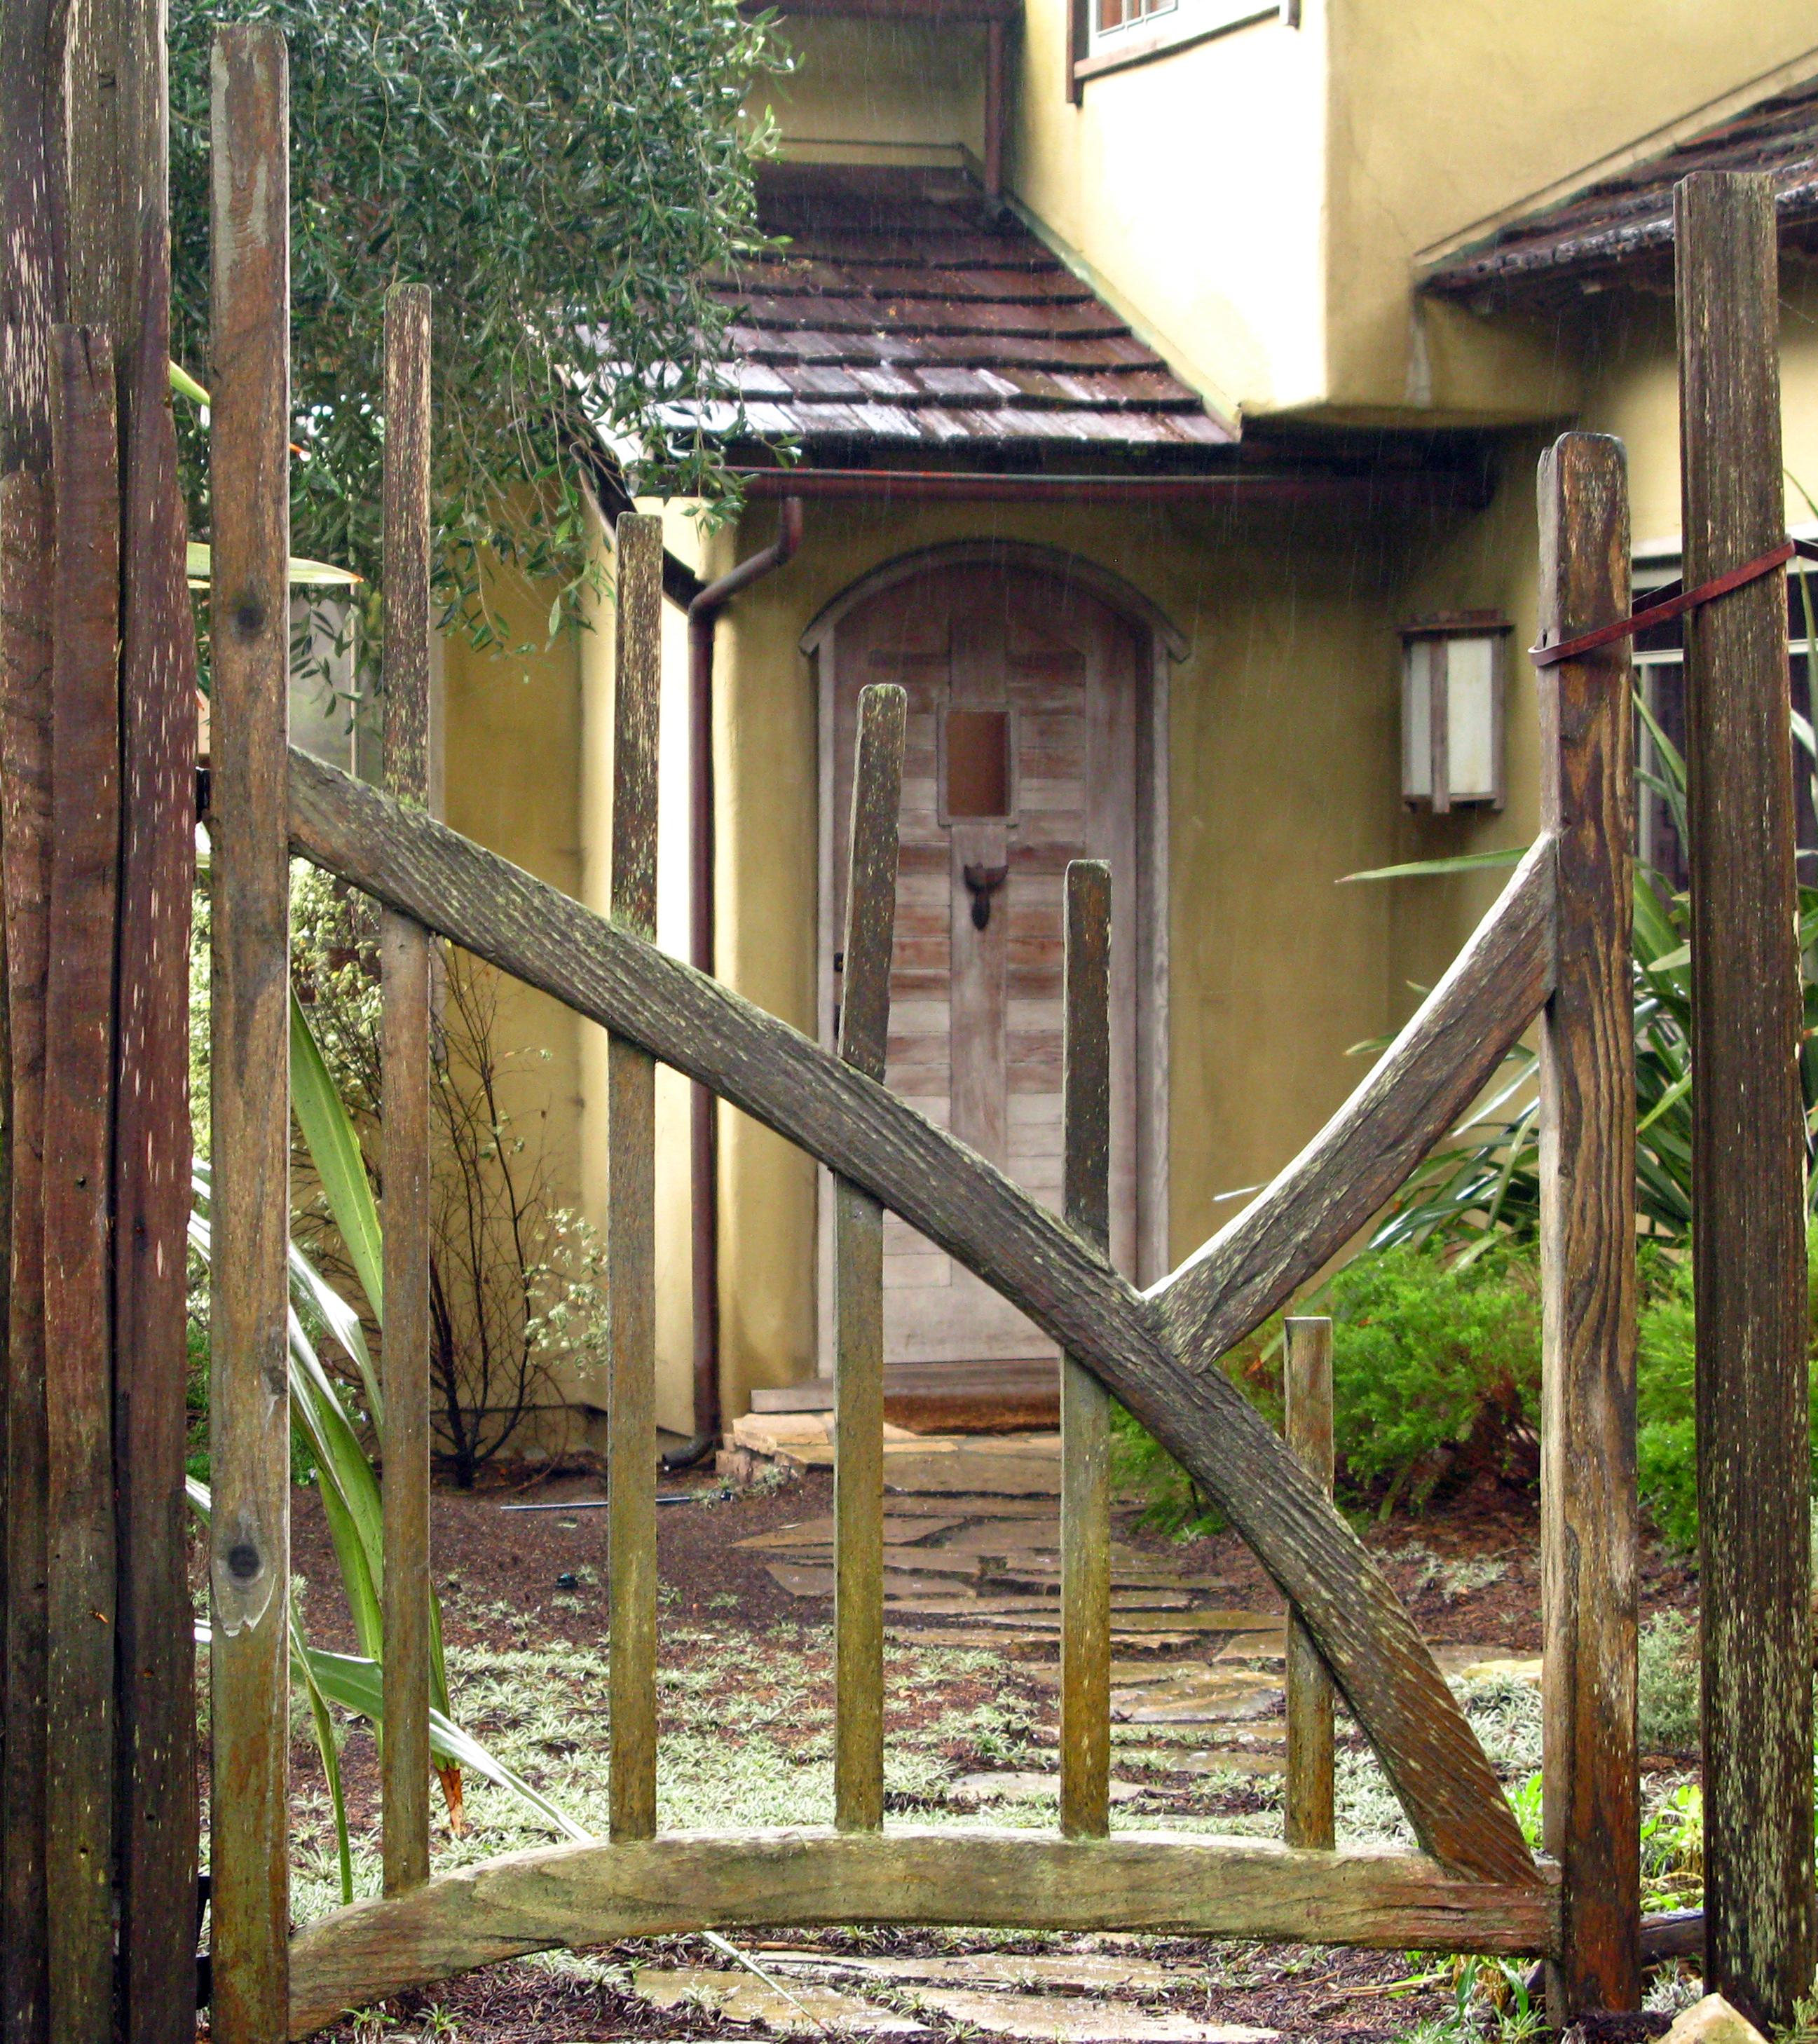 Fences And Gates: PDF How To Build A Backyard Fence Gate DIY Free Plans